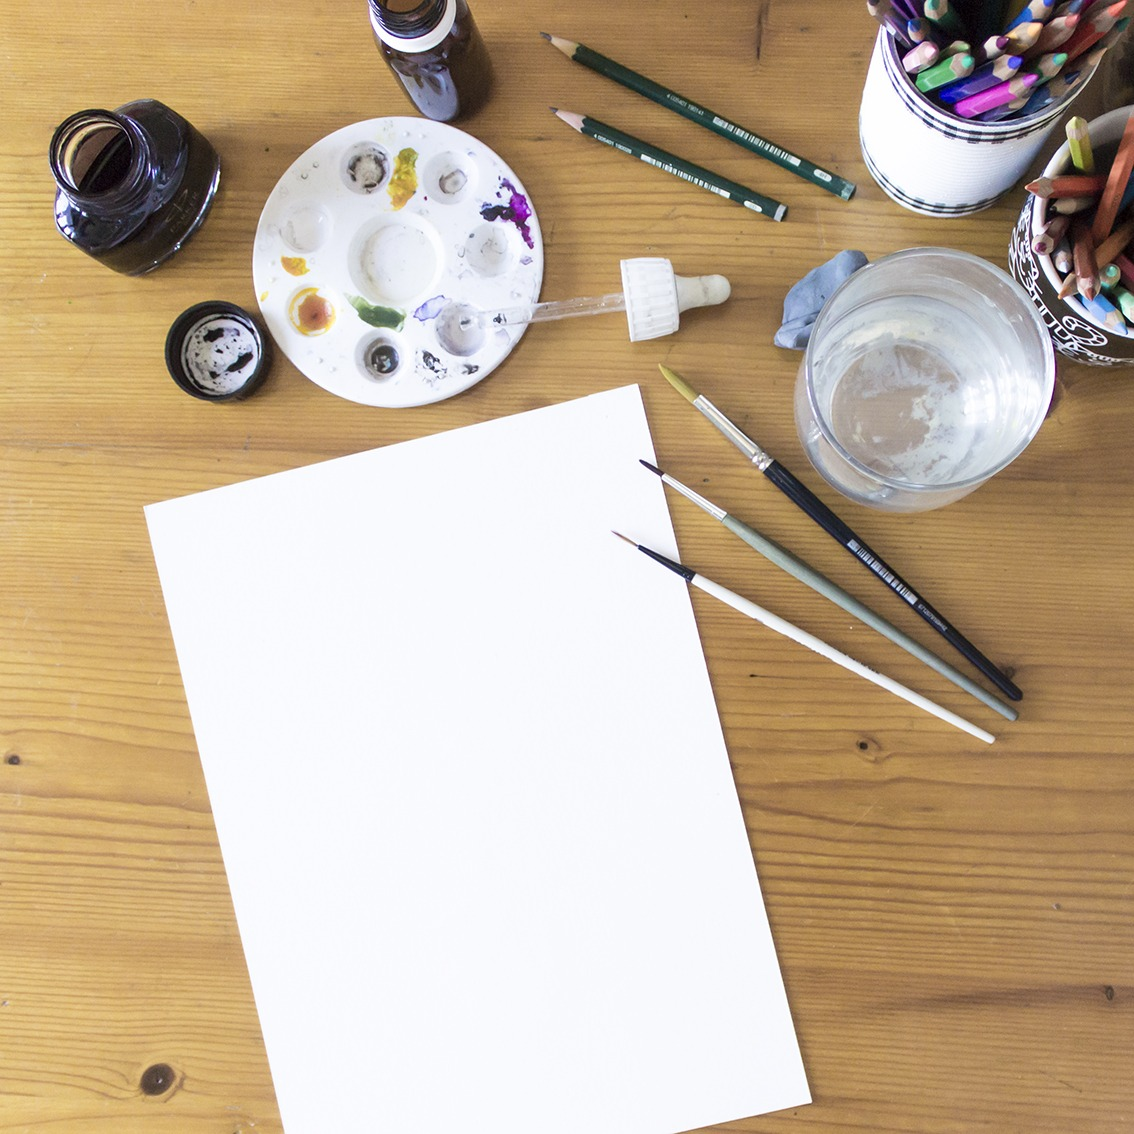 Inktober, Jake Parker, Inktober Official list, Inktober 2018 prompt official list, Inktober 2018, white paper, desk, on the table,